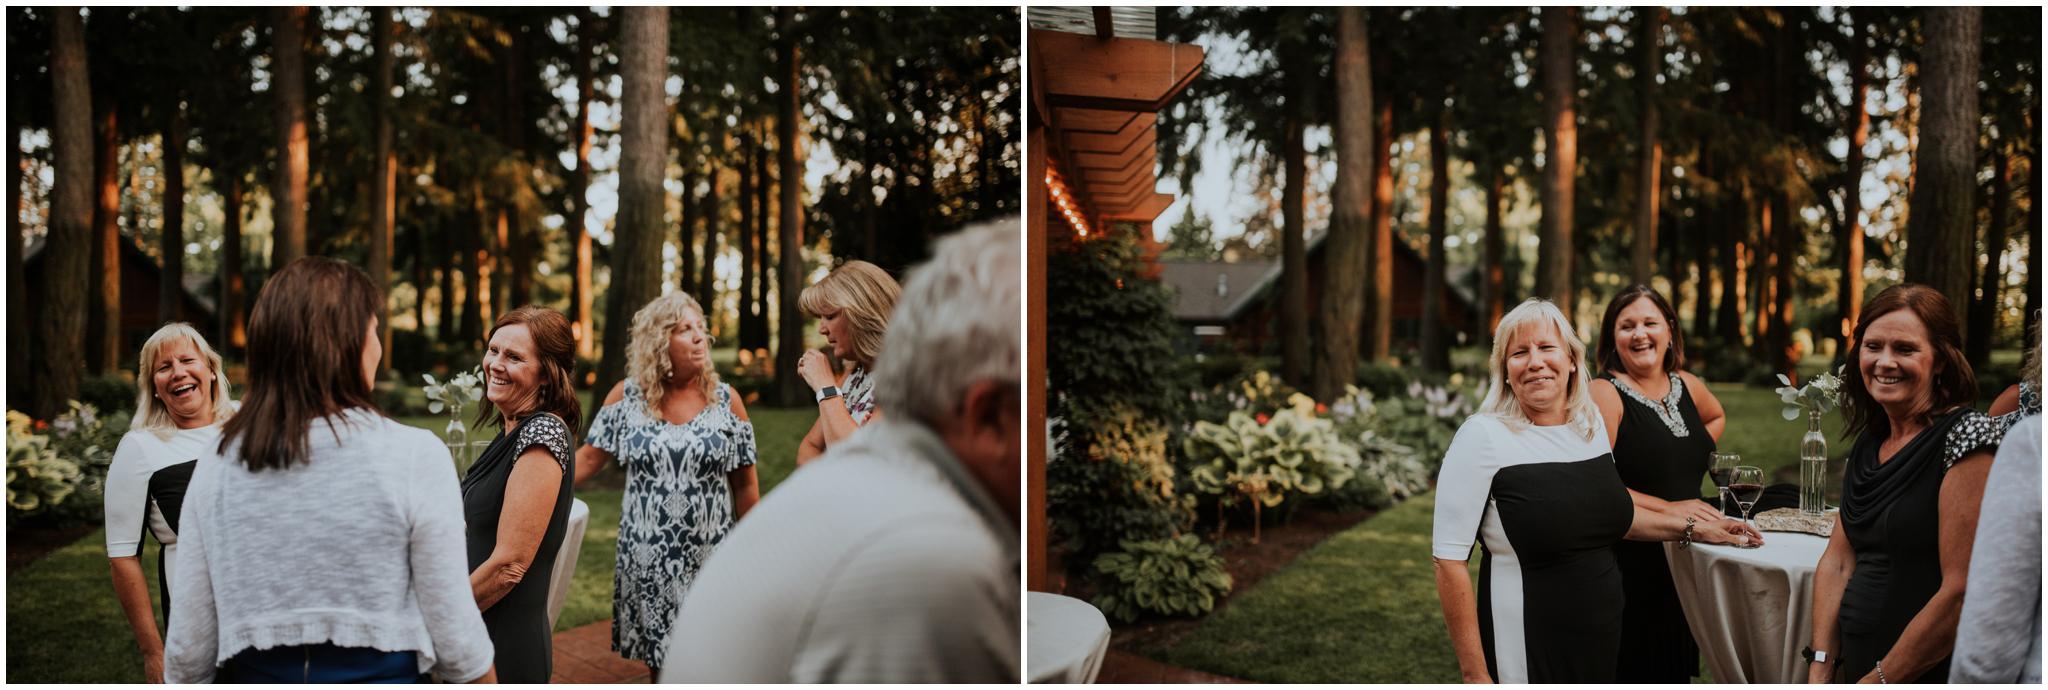 erin-and-tyler-evergreen-gardens-bellingham-wedding-photographer-146.jpg